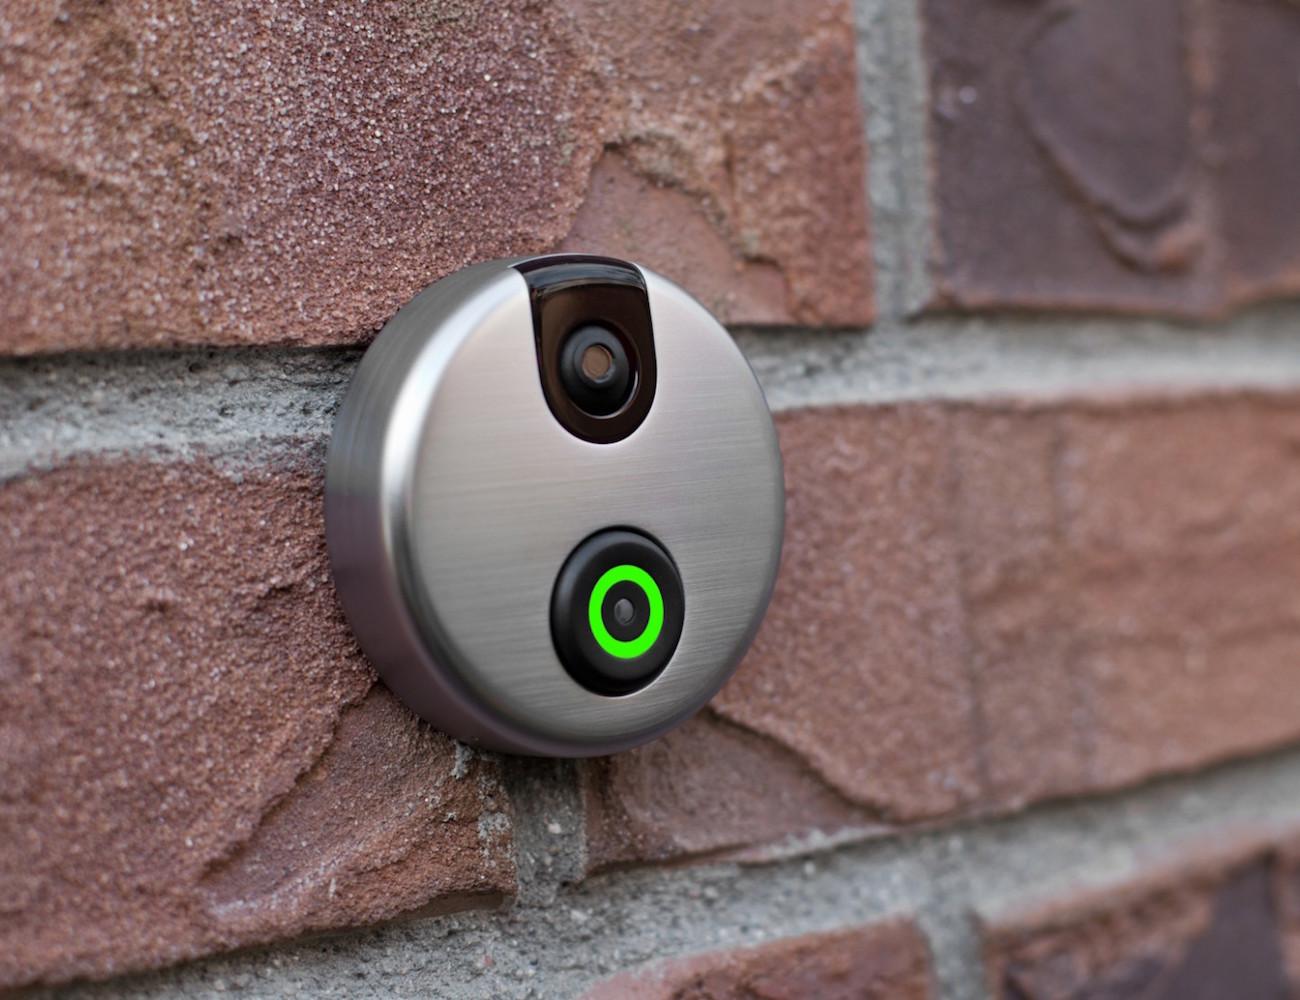 SkyBell – Wi-Fi Video Doorbell